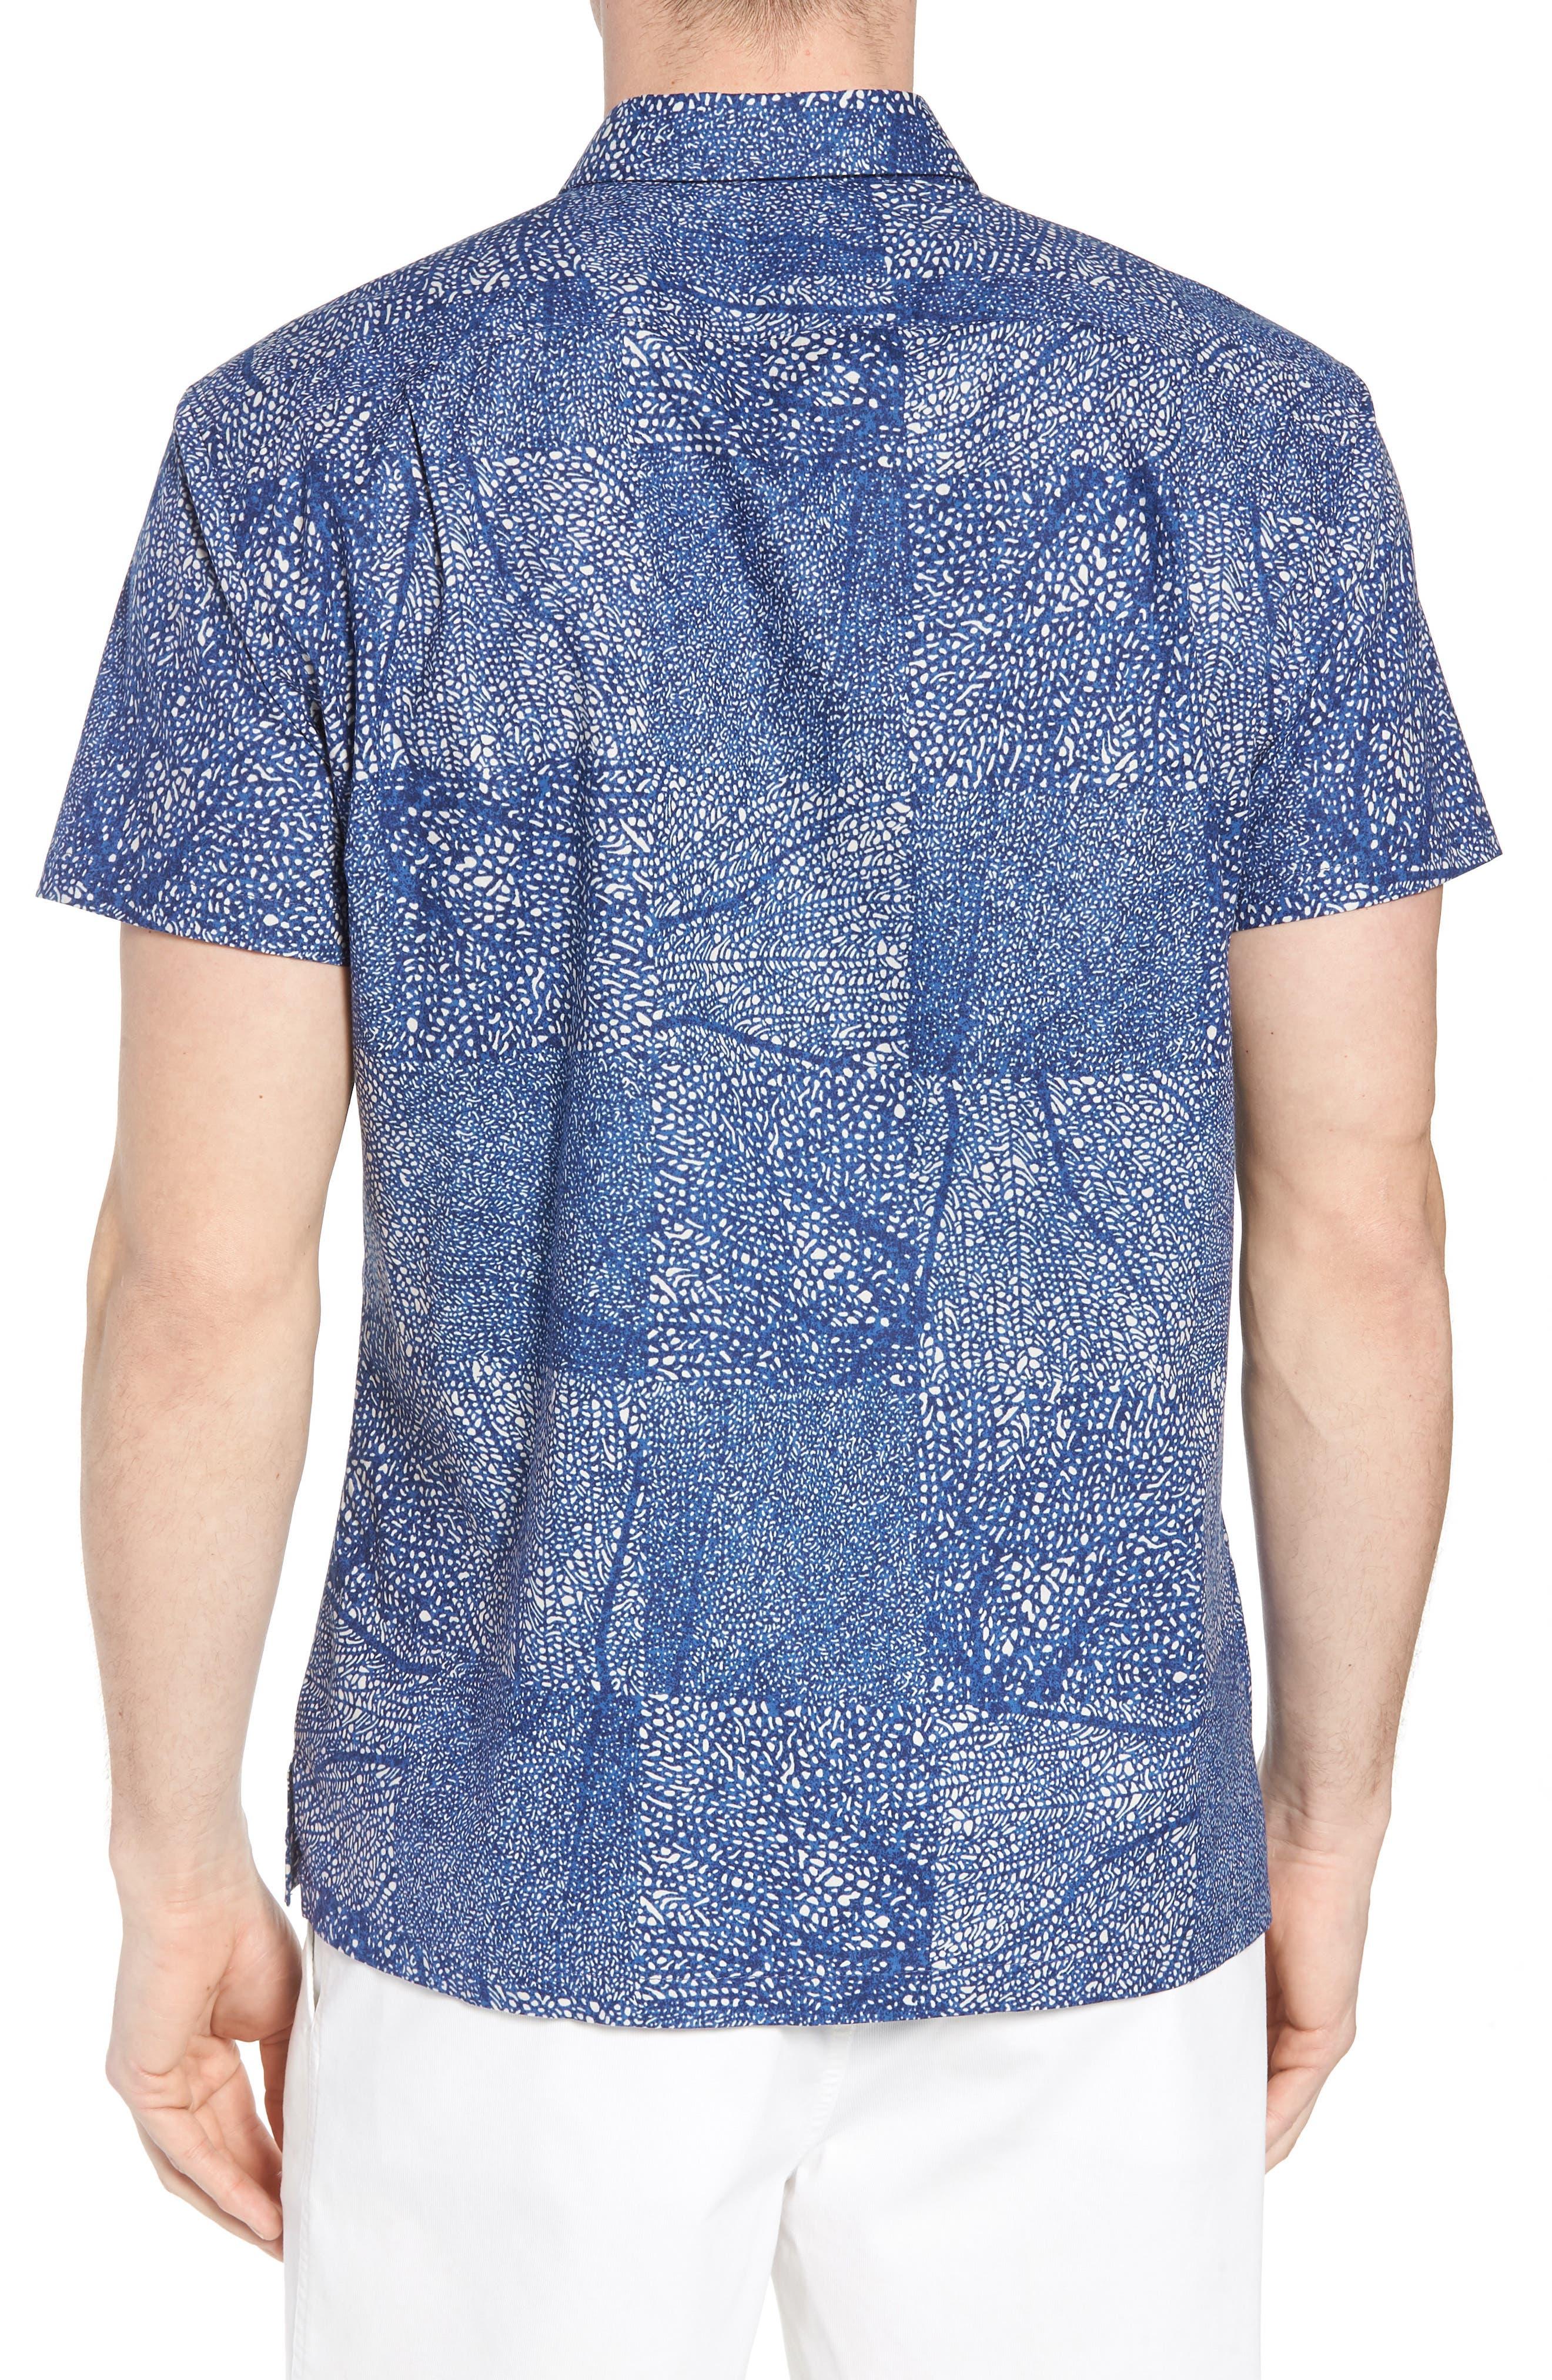 Black Coral Trim Fit Camp Shirt,                             Alternate thumbnail 3, color,                             Navy